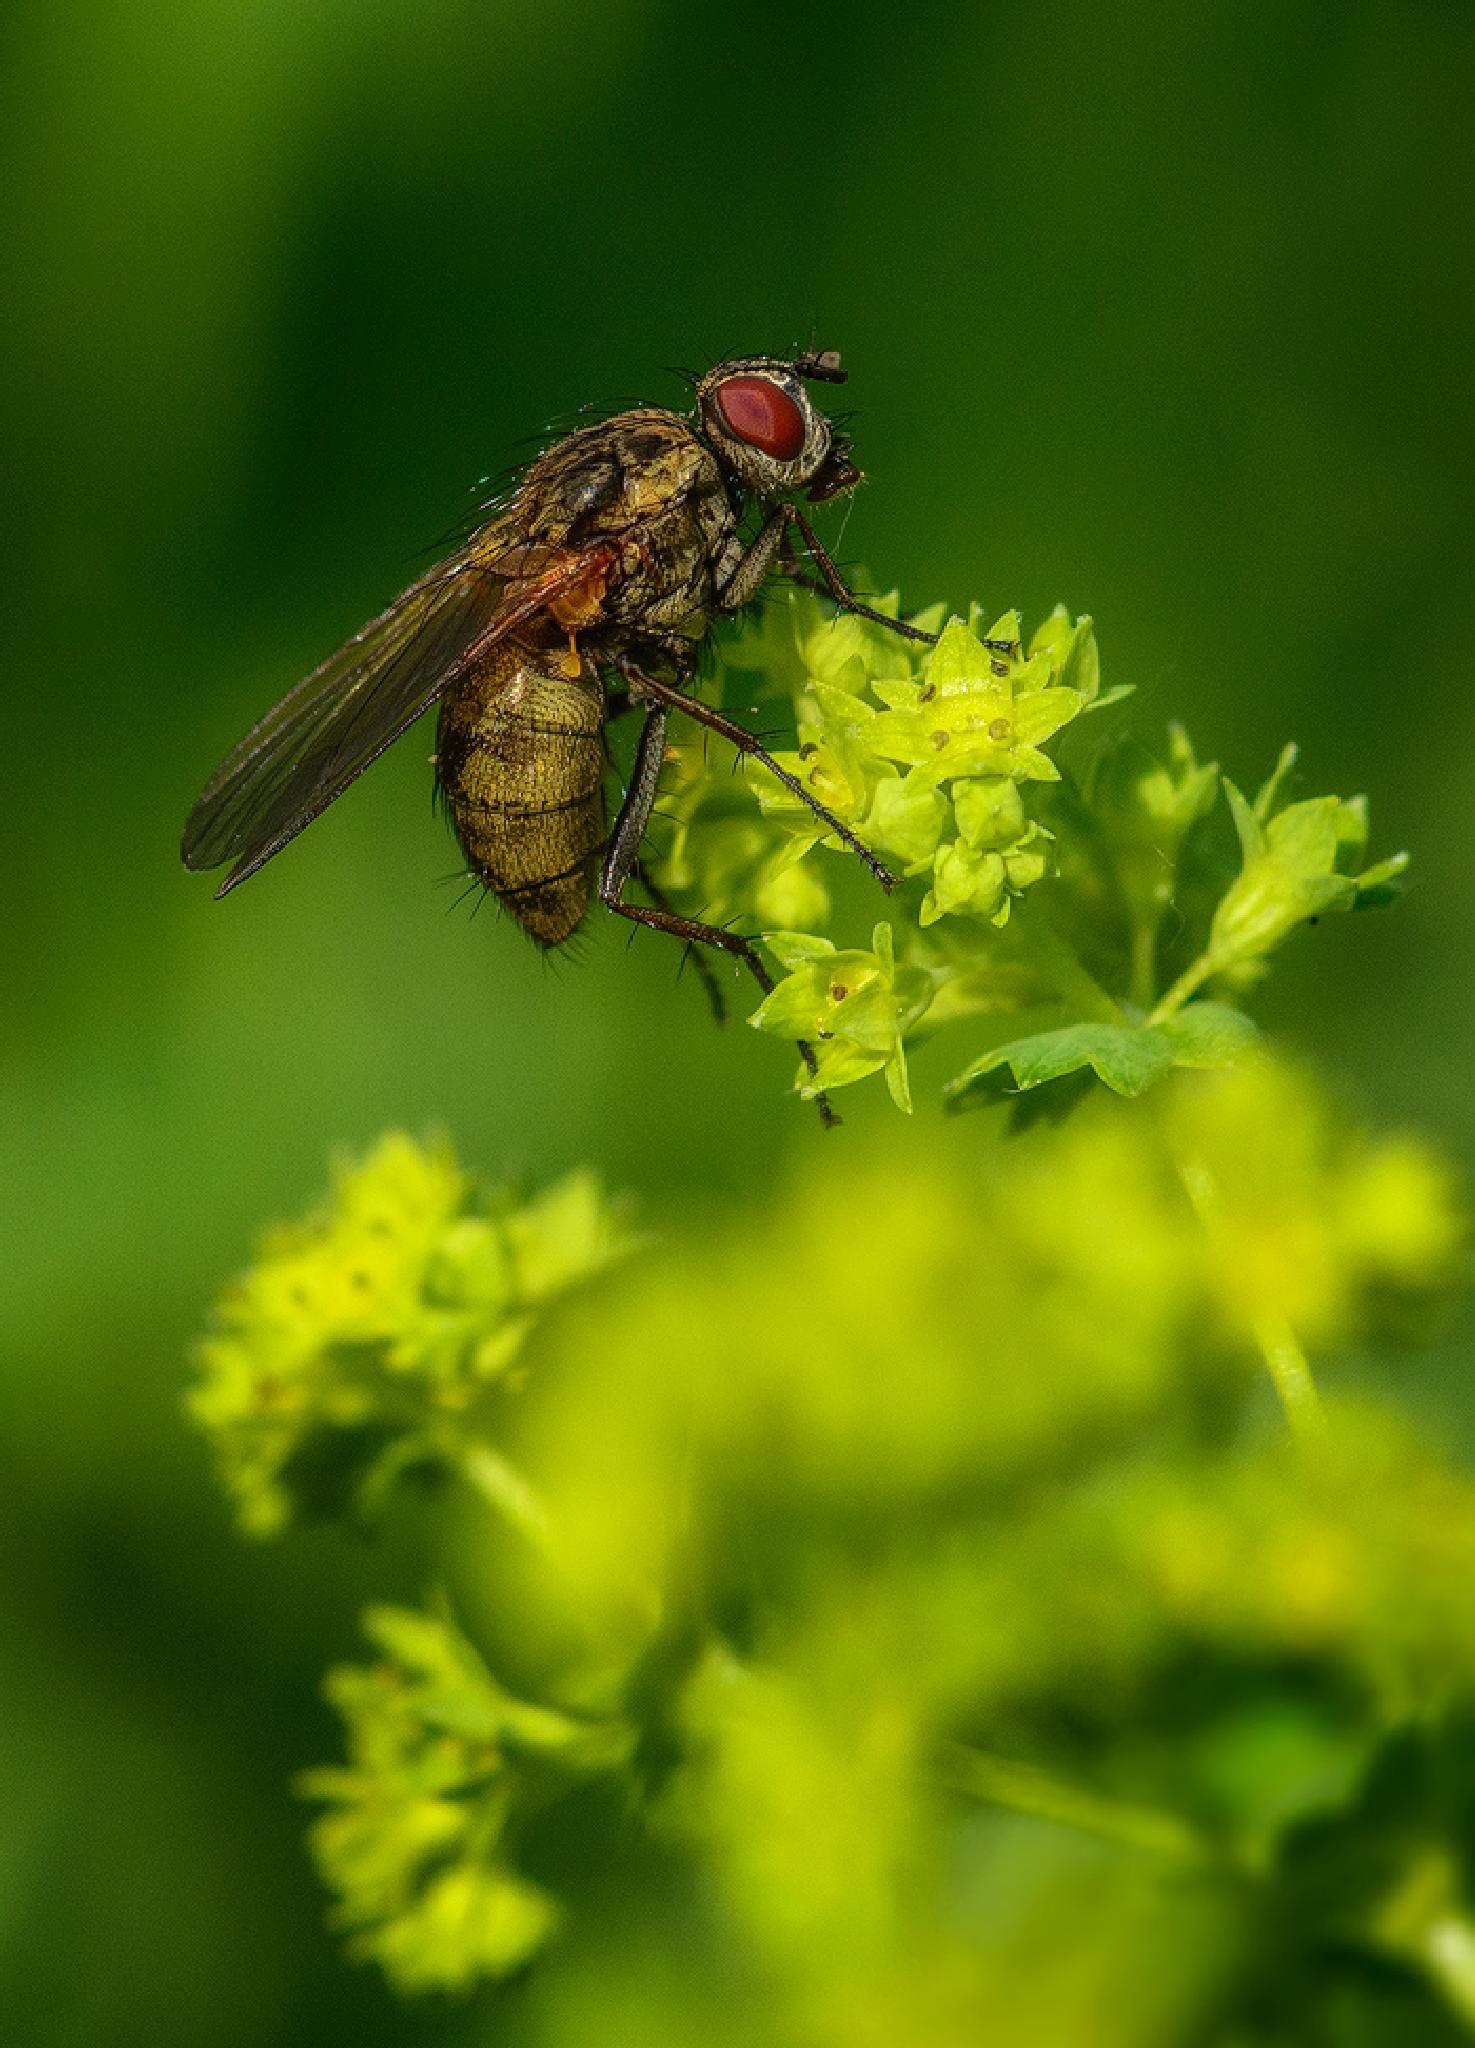 Fly by Kirill Volkov